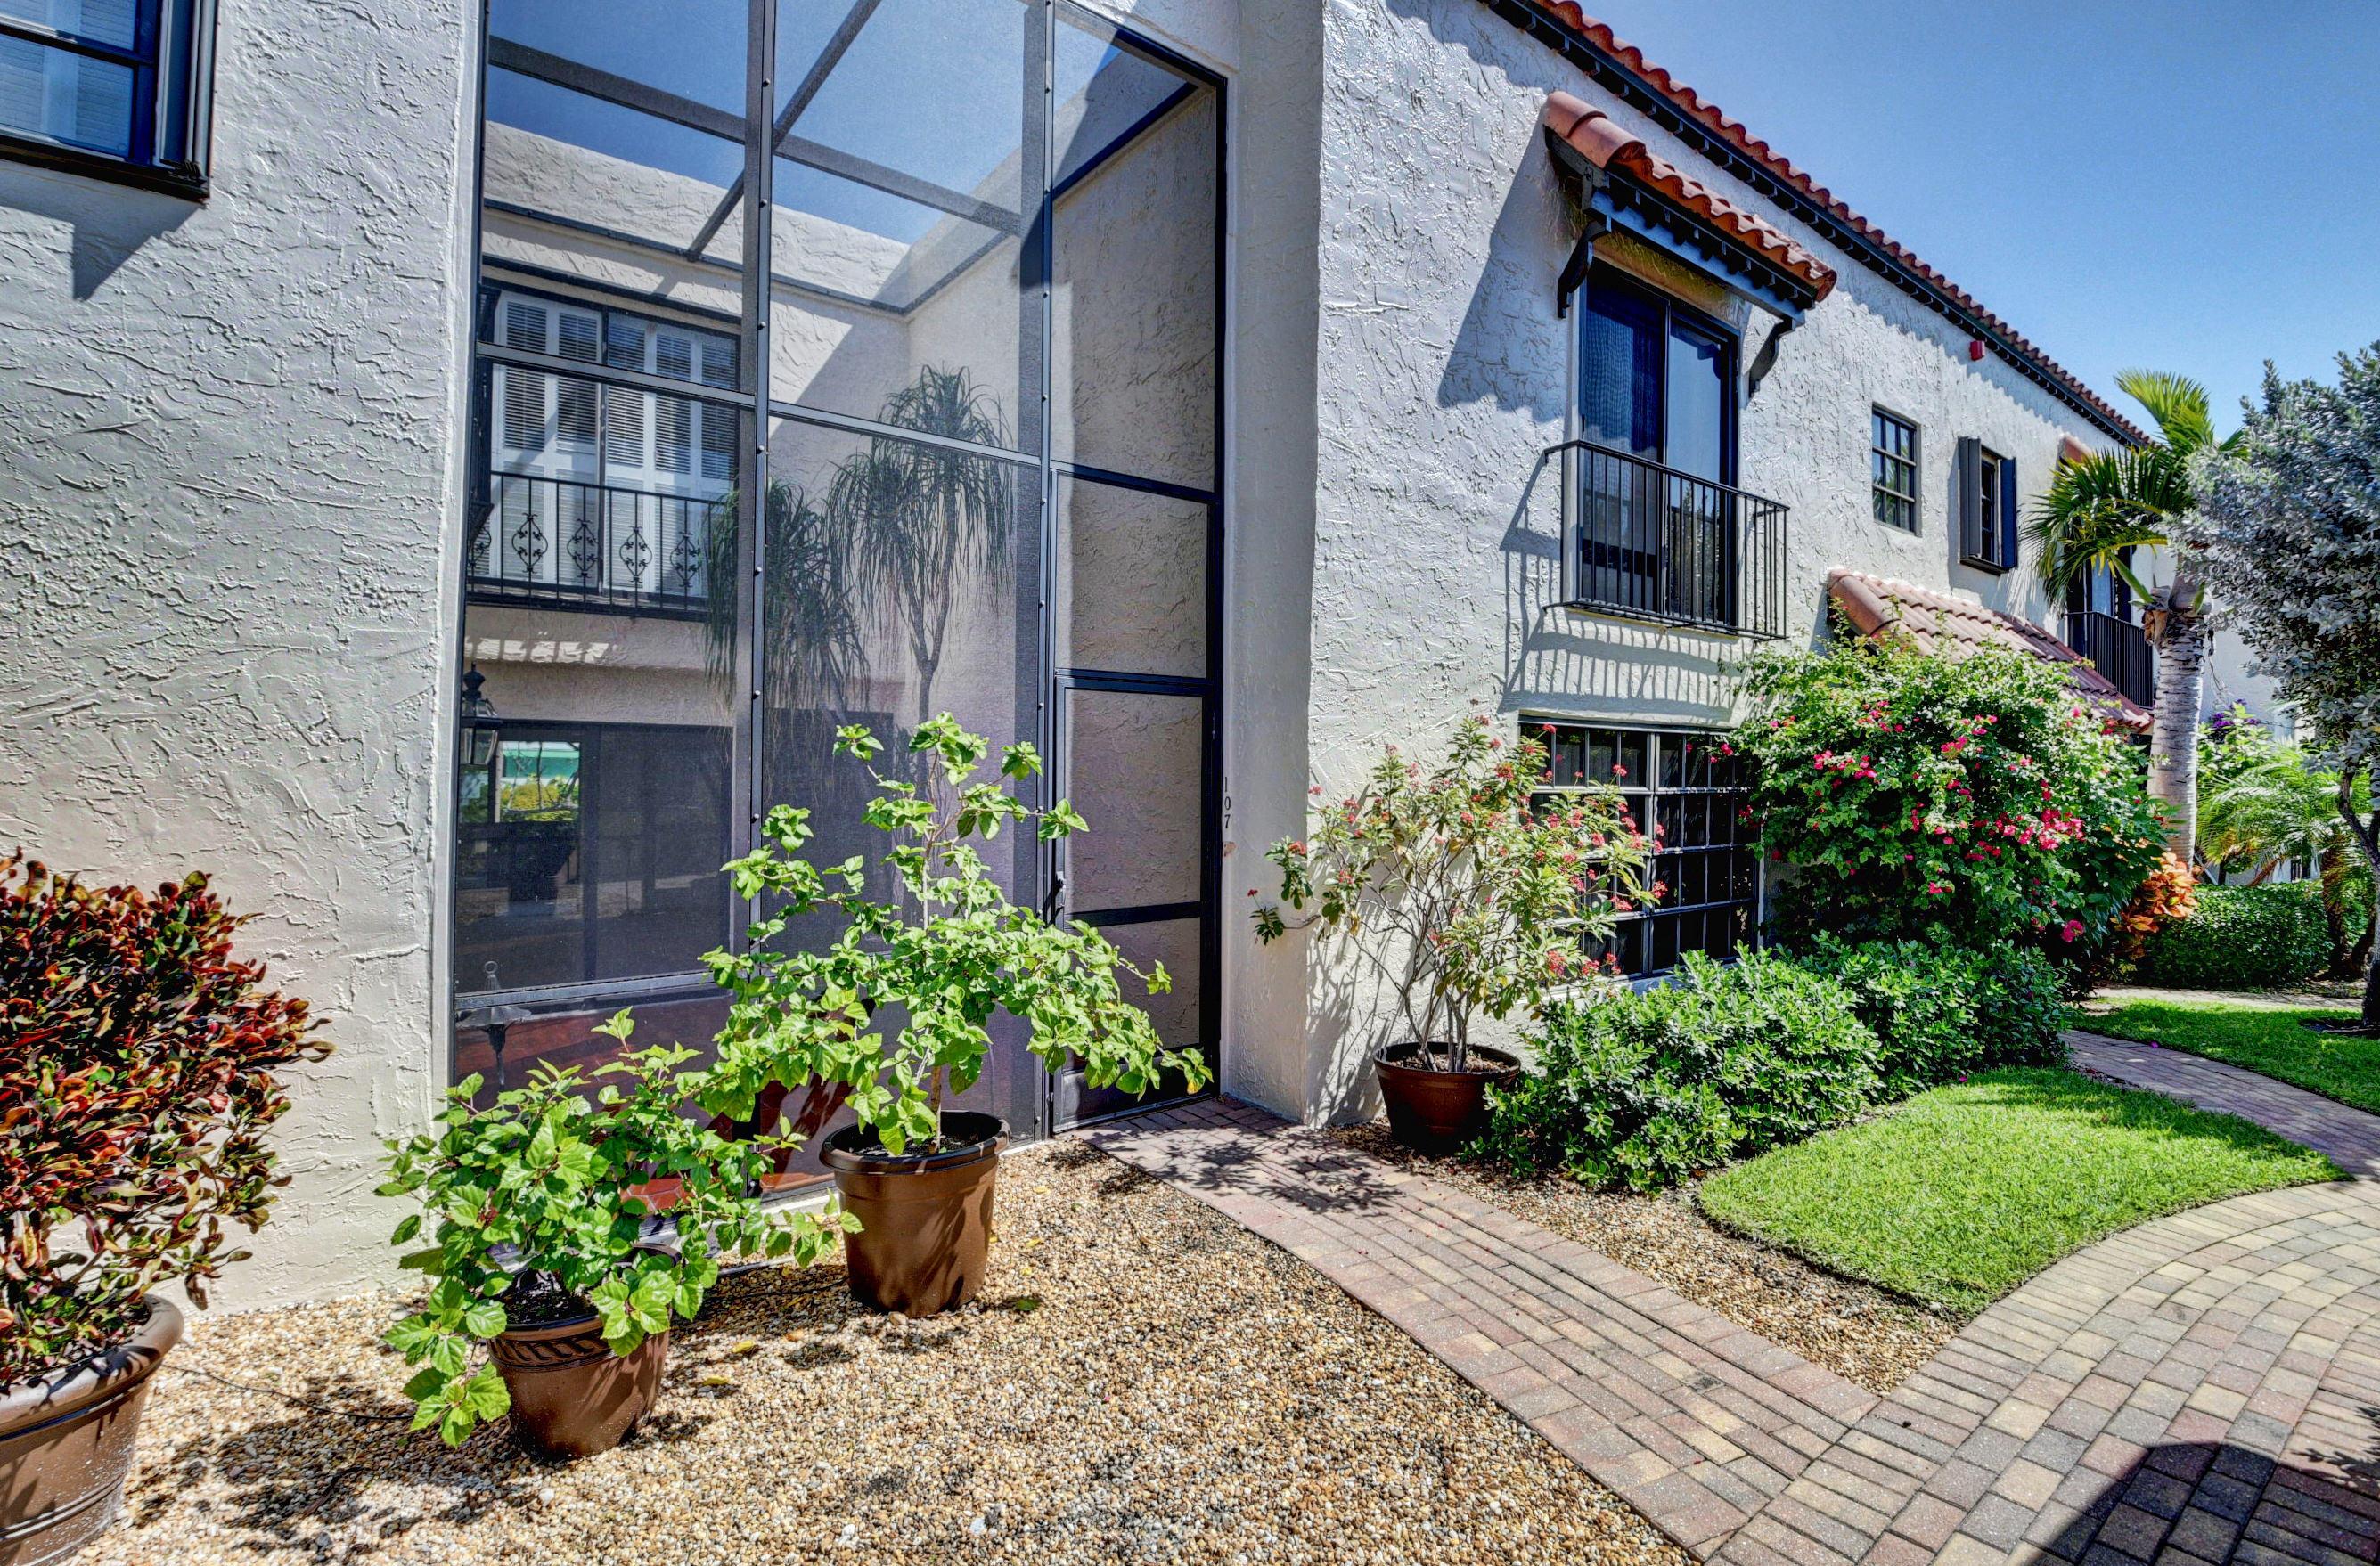 Jardin Del Mar Homes For Sale In Delray Beach Fl